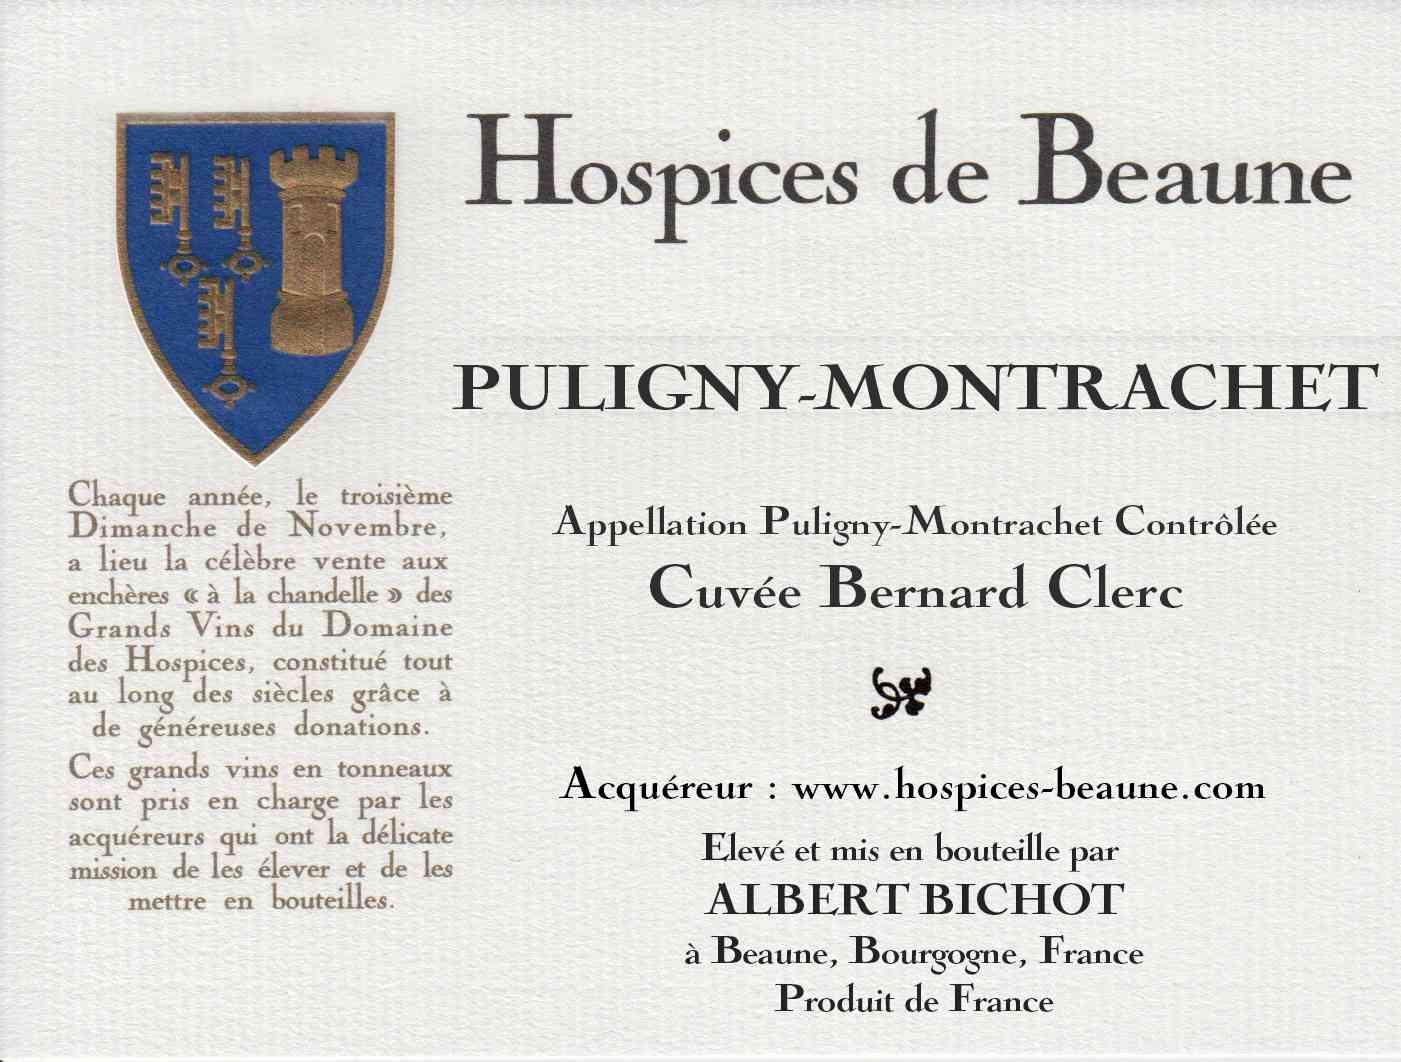 Encheres-auction-HospicesdeBeaune-AlbertBichot-SantenayPremierCru-PulignyMontrachet-cuvee-BernardClerc